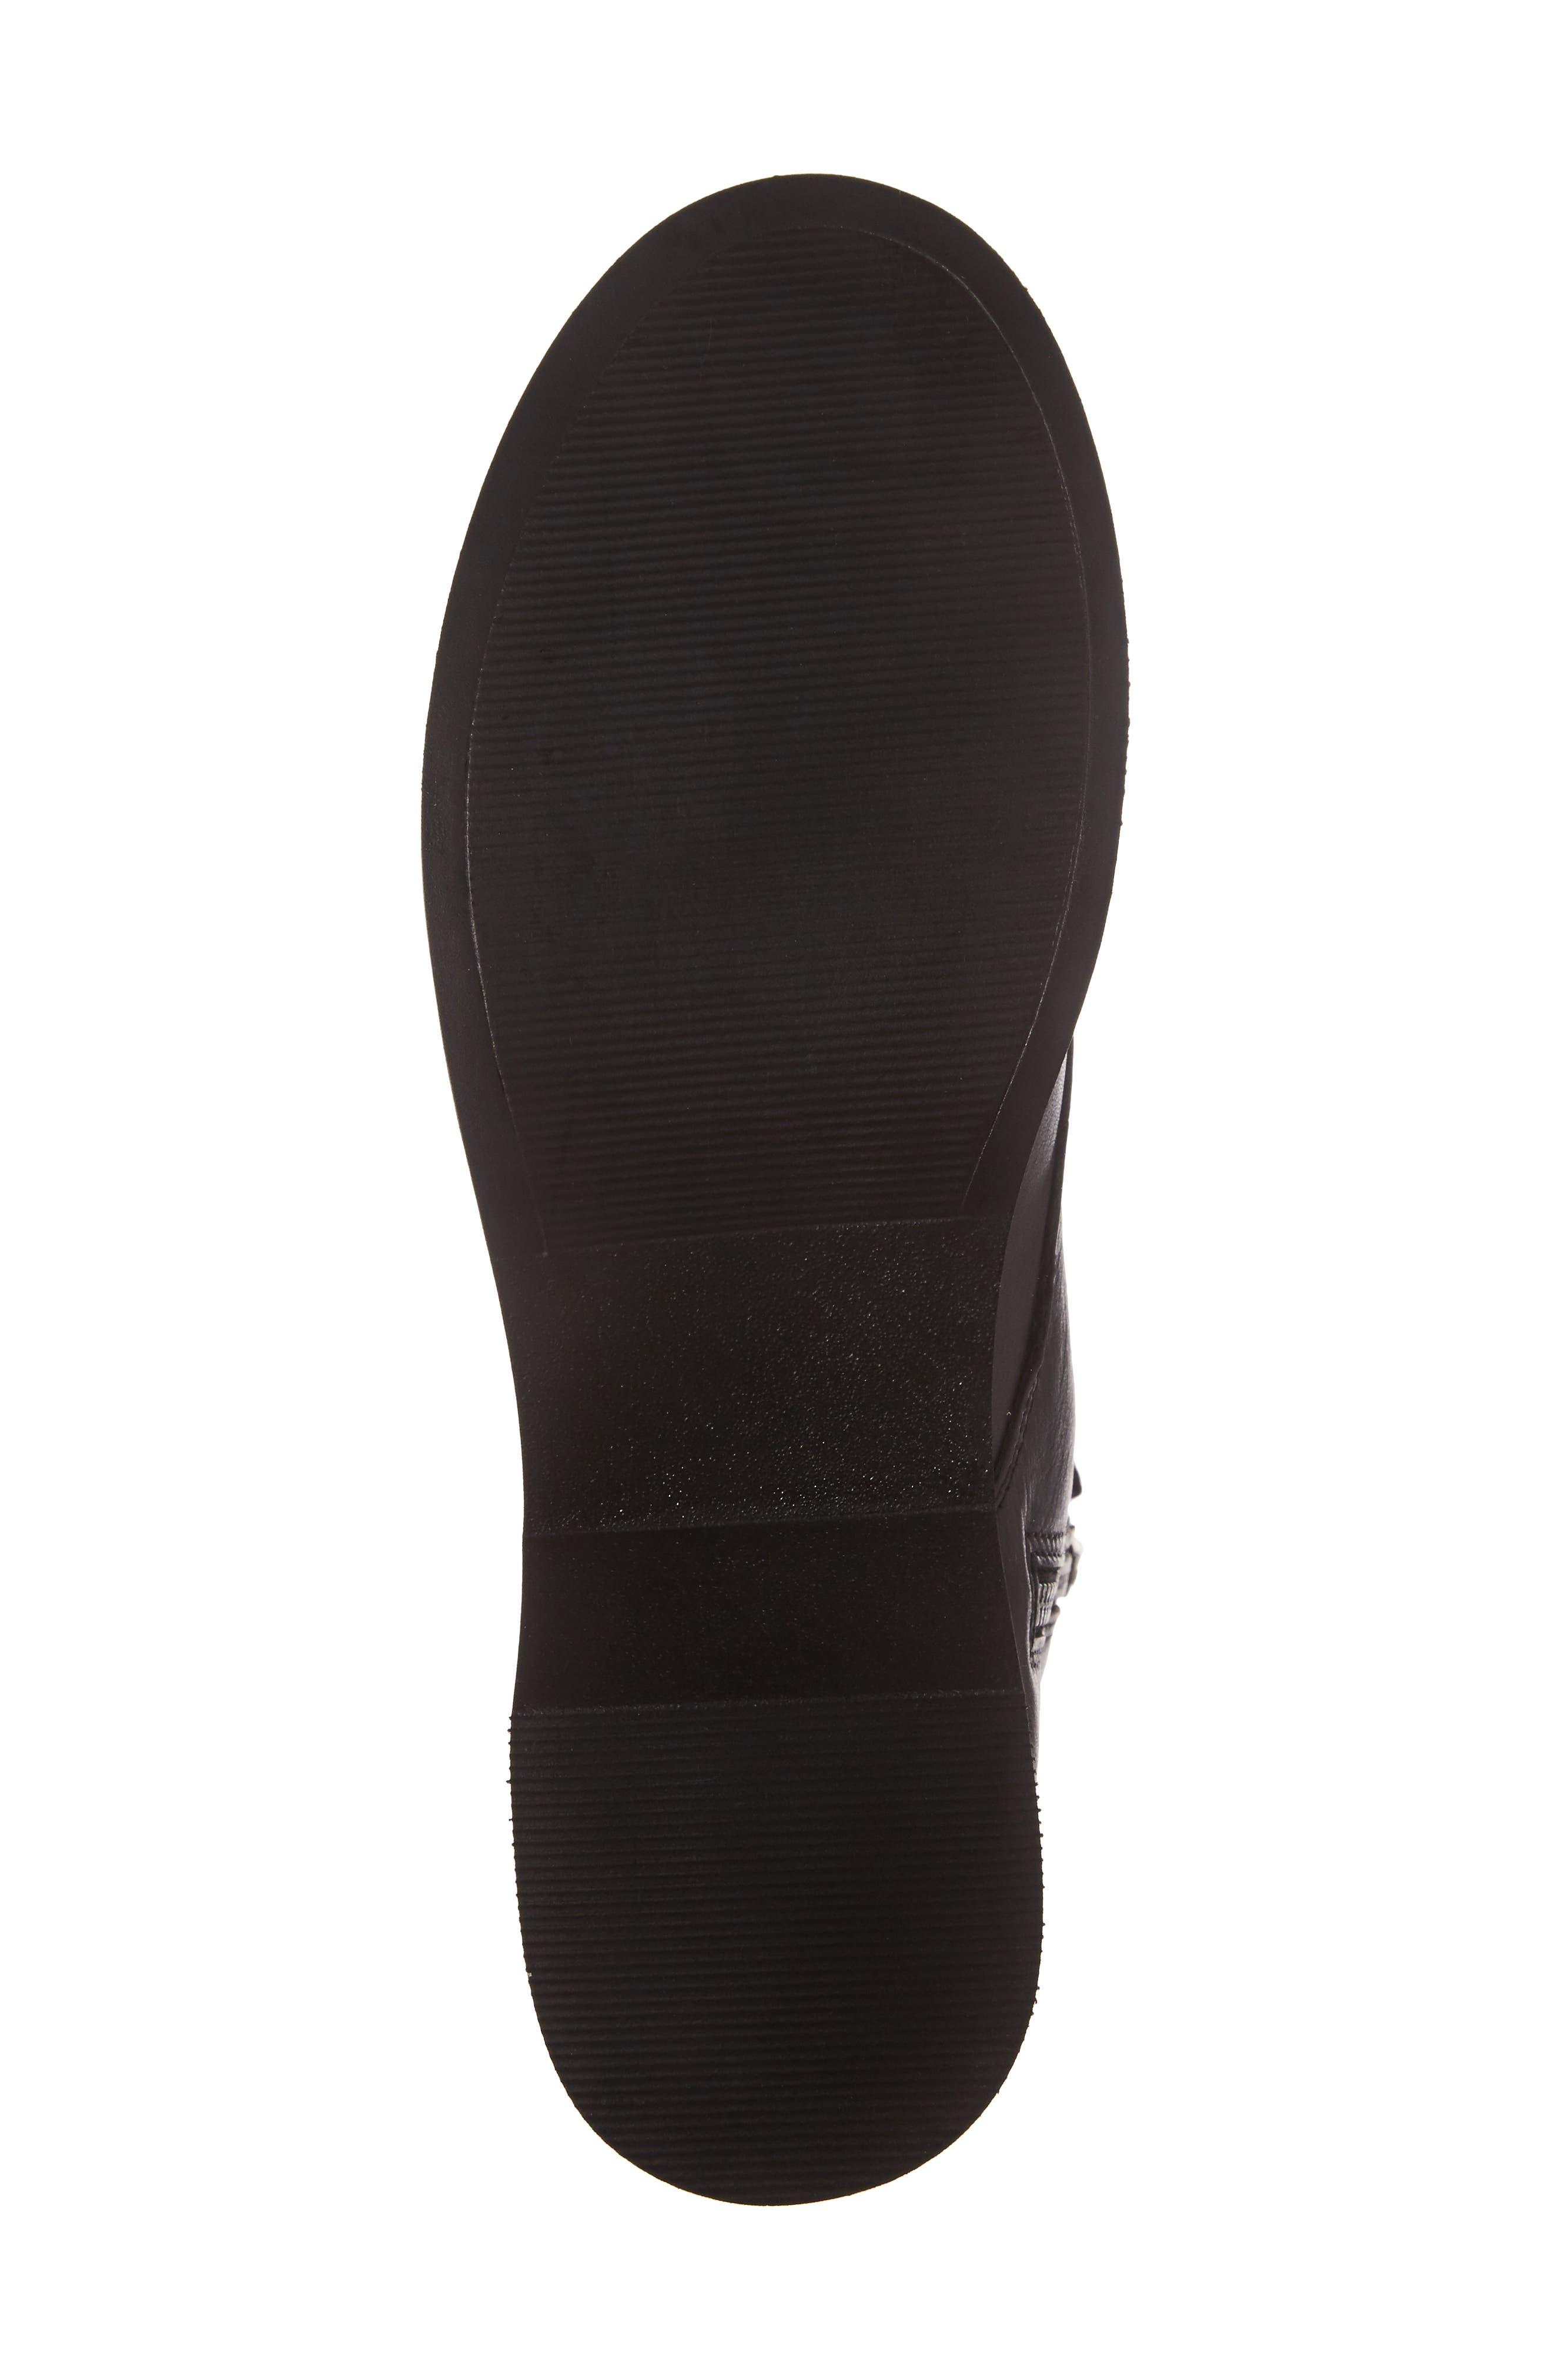 Rocco Combat Boot,                             Alternate thumbnail 6, color,                             Black Leather